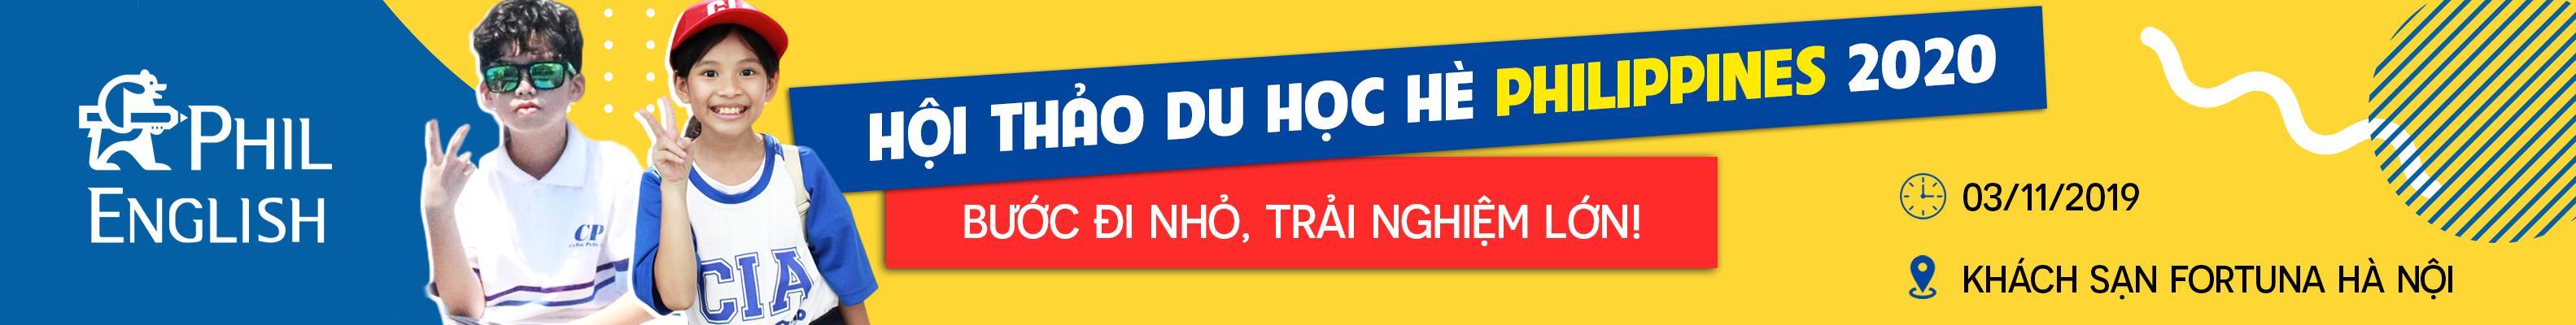 hoi-thao-du-hoc-he-philippines-1